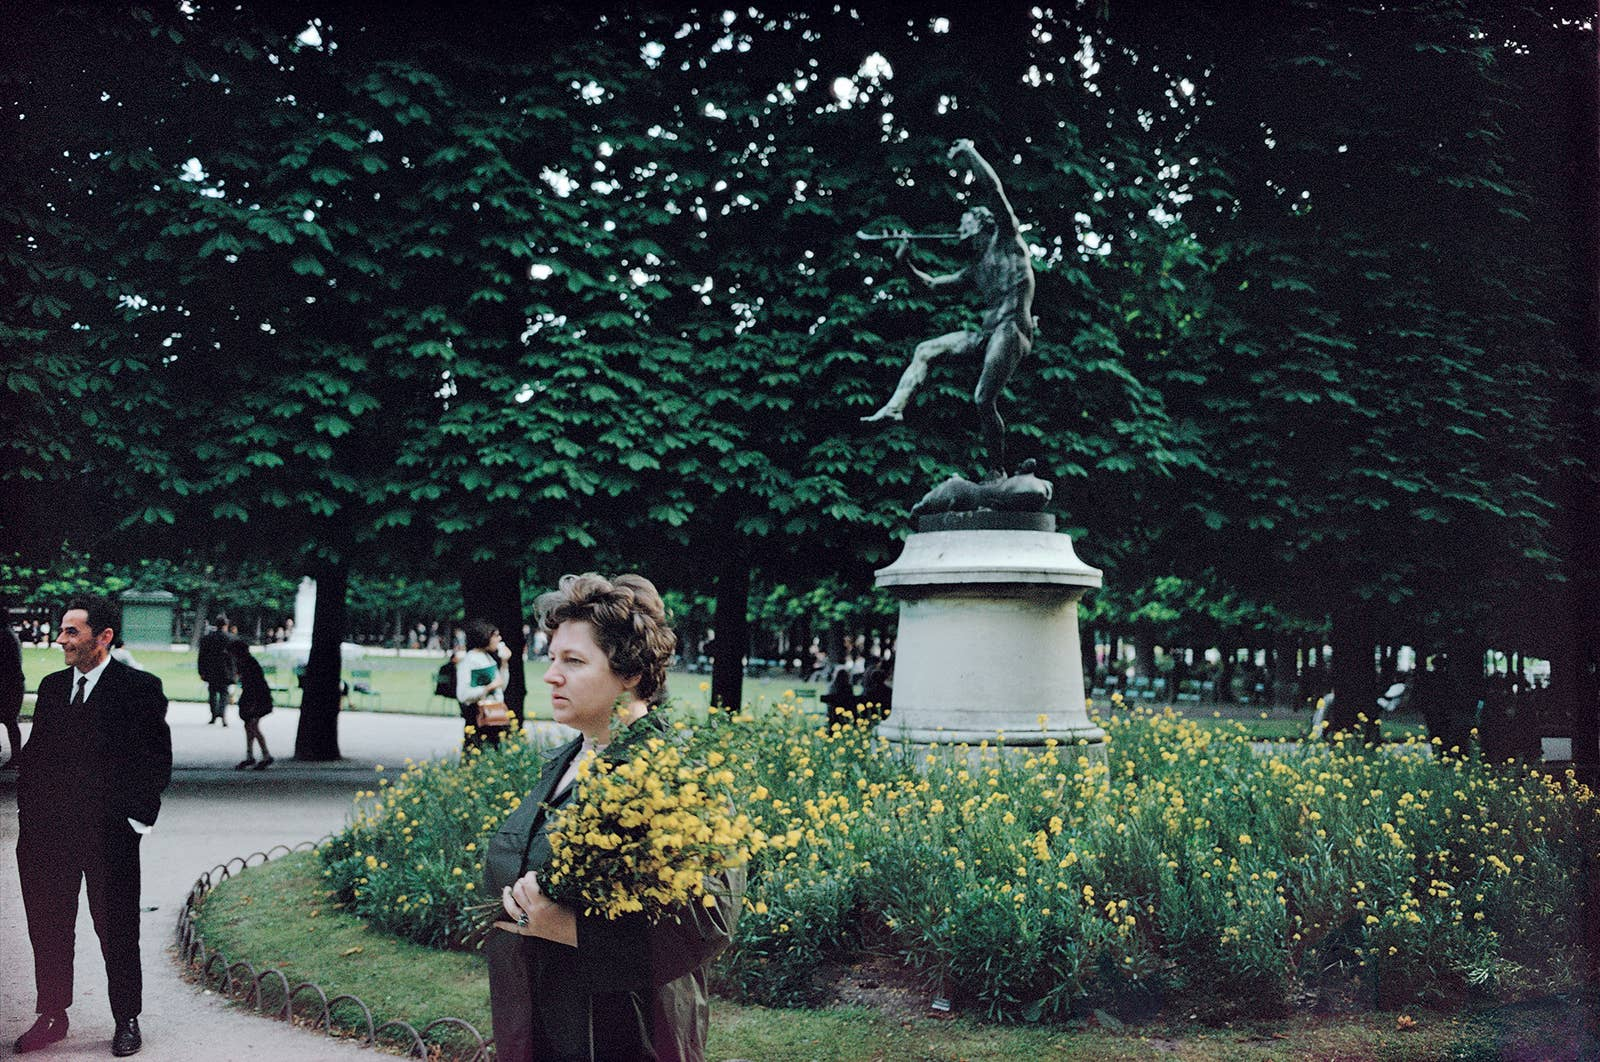 A woman carries flowers through a city park